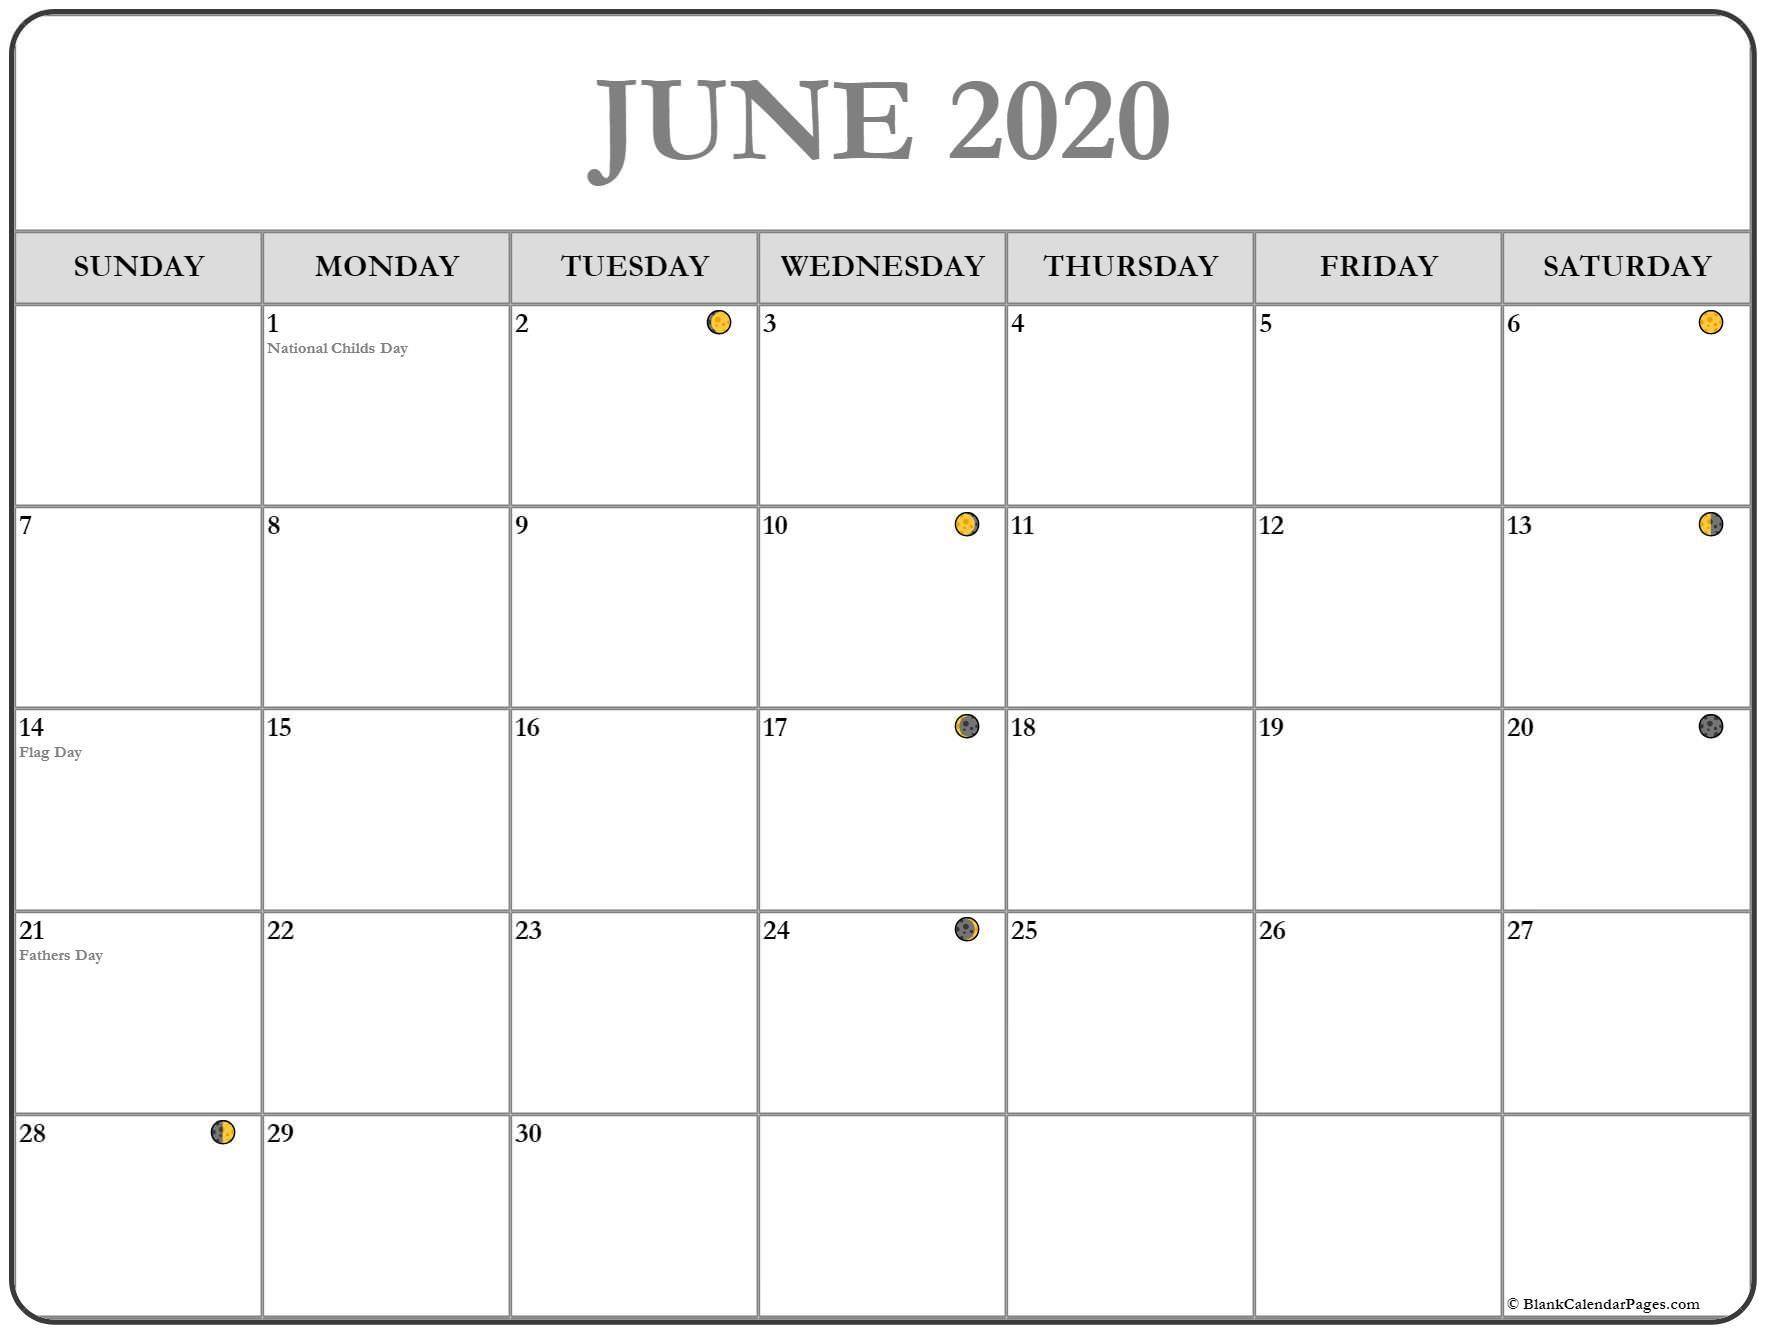 June Moon Phases Calendar In